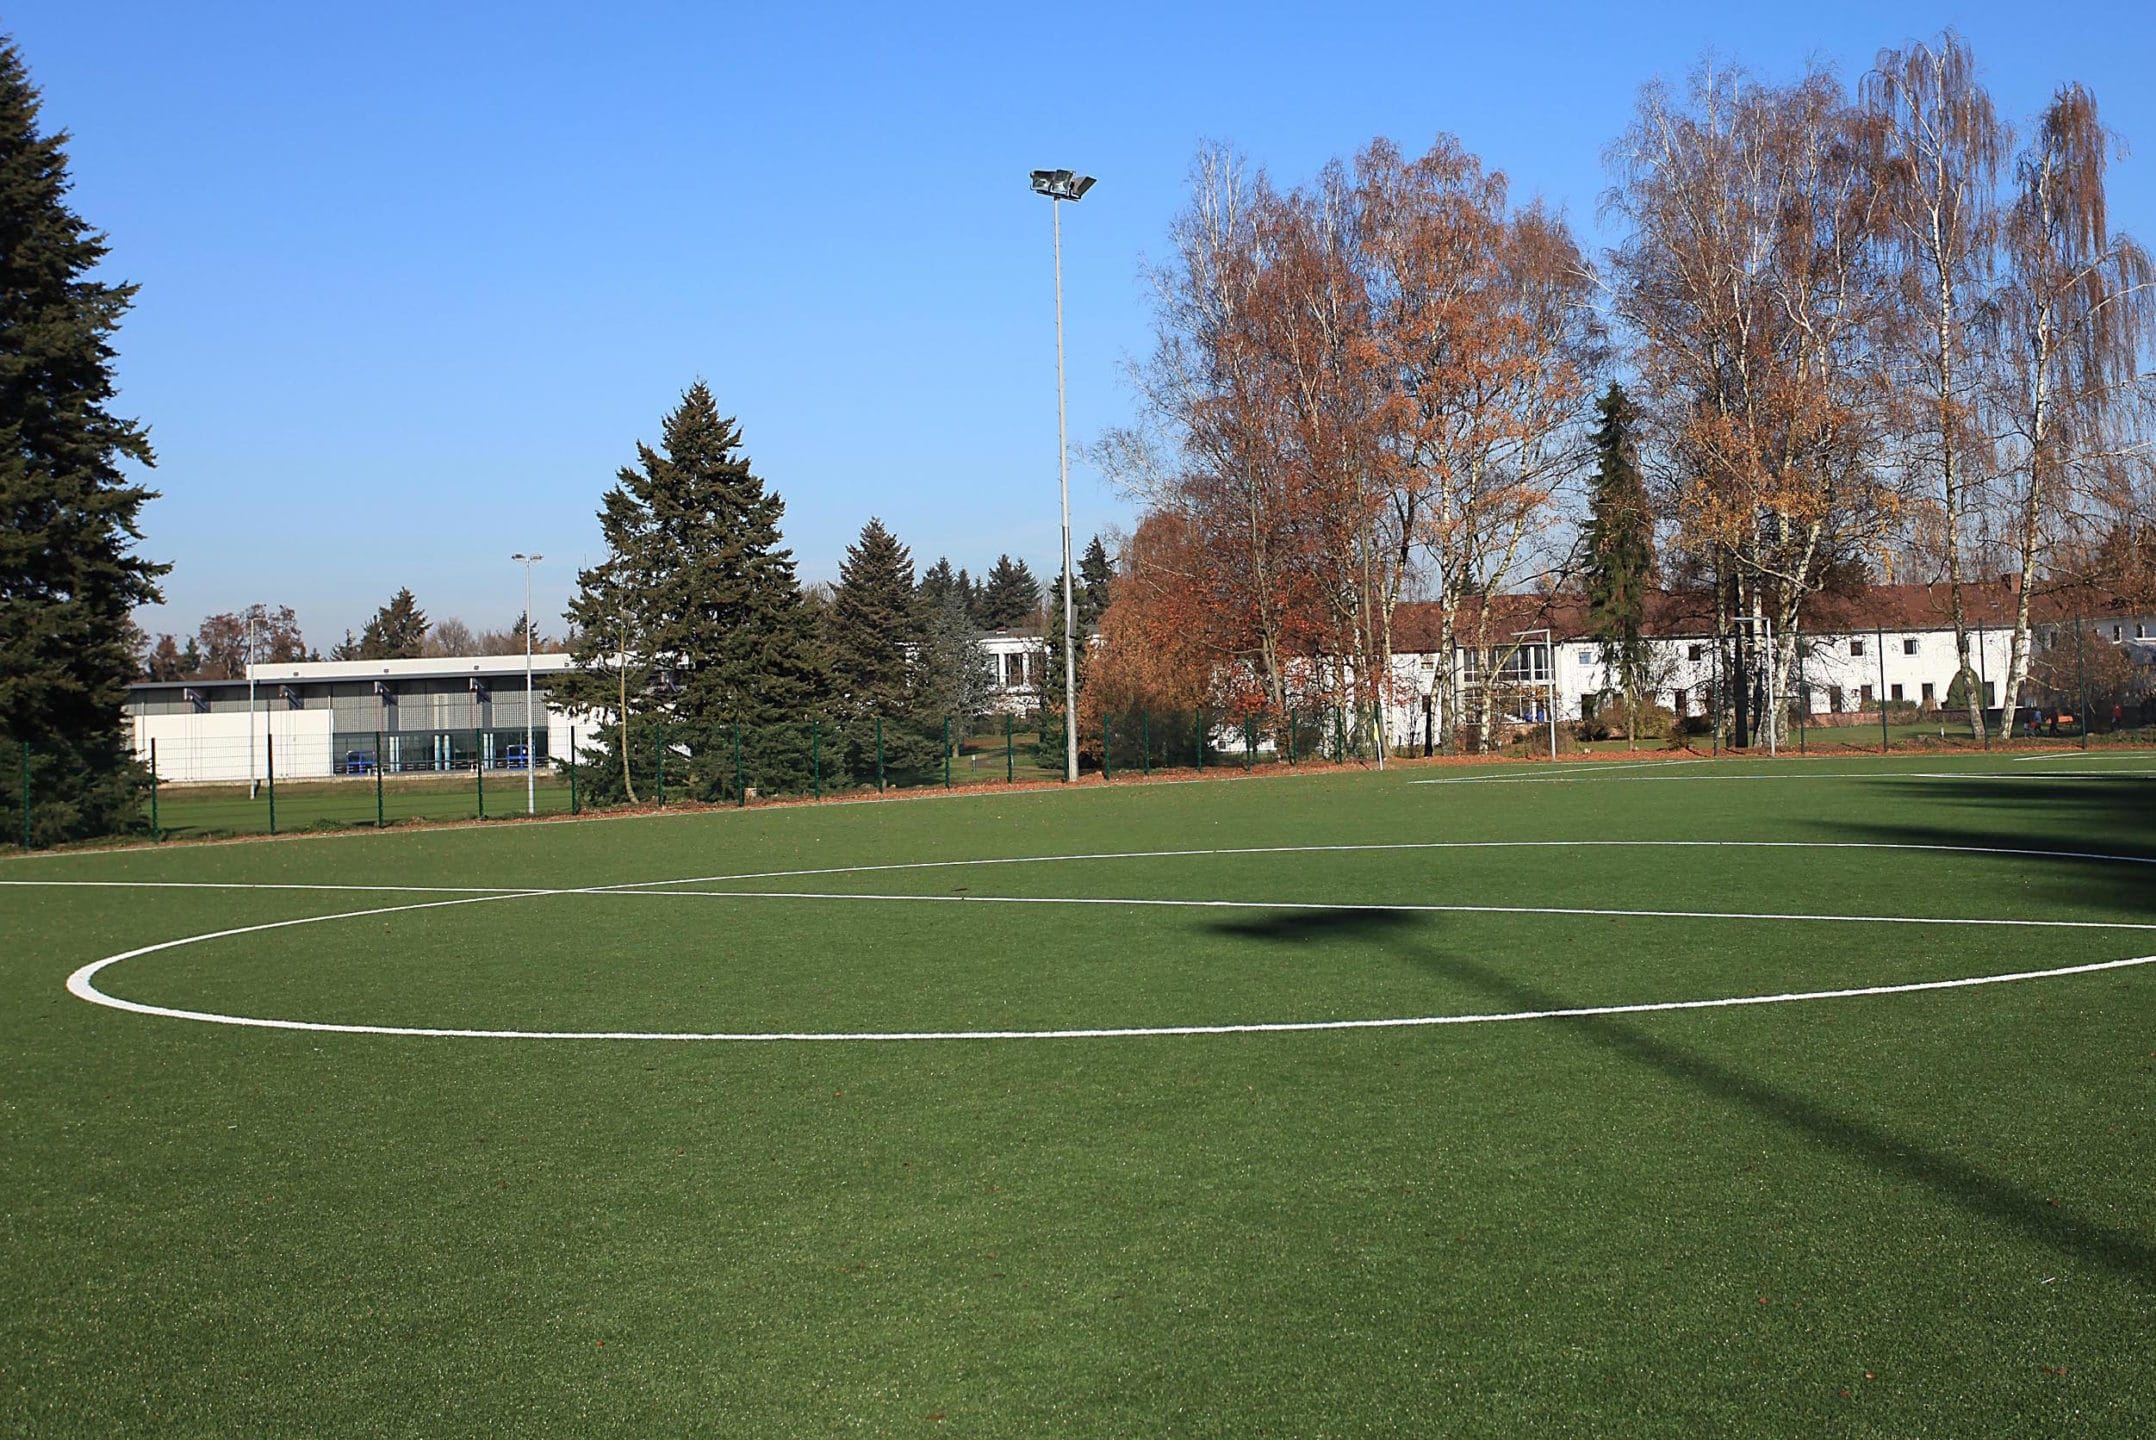 Kunstrasenplatz beim Fussball Trainingslager Sporthotel Mittelhessen